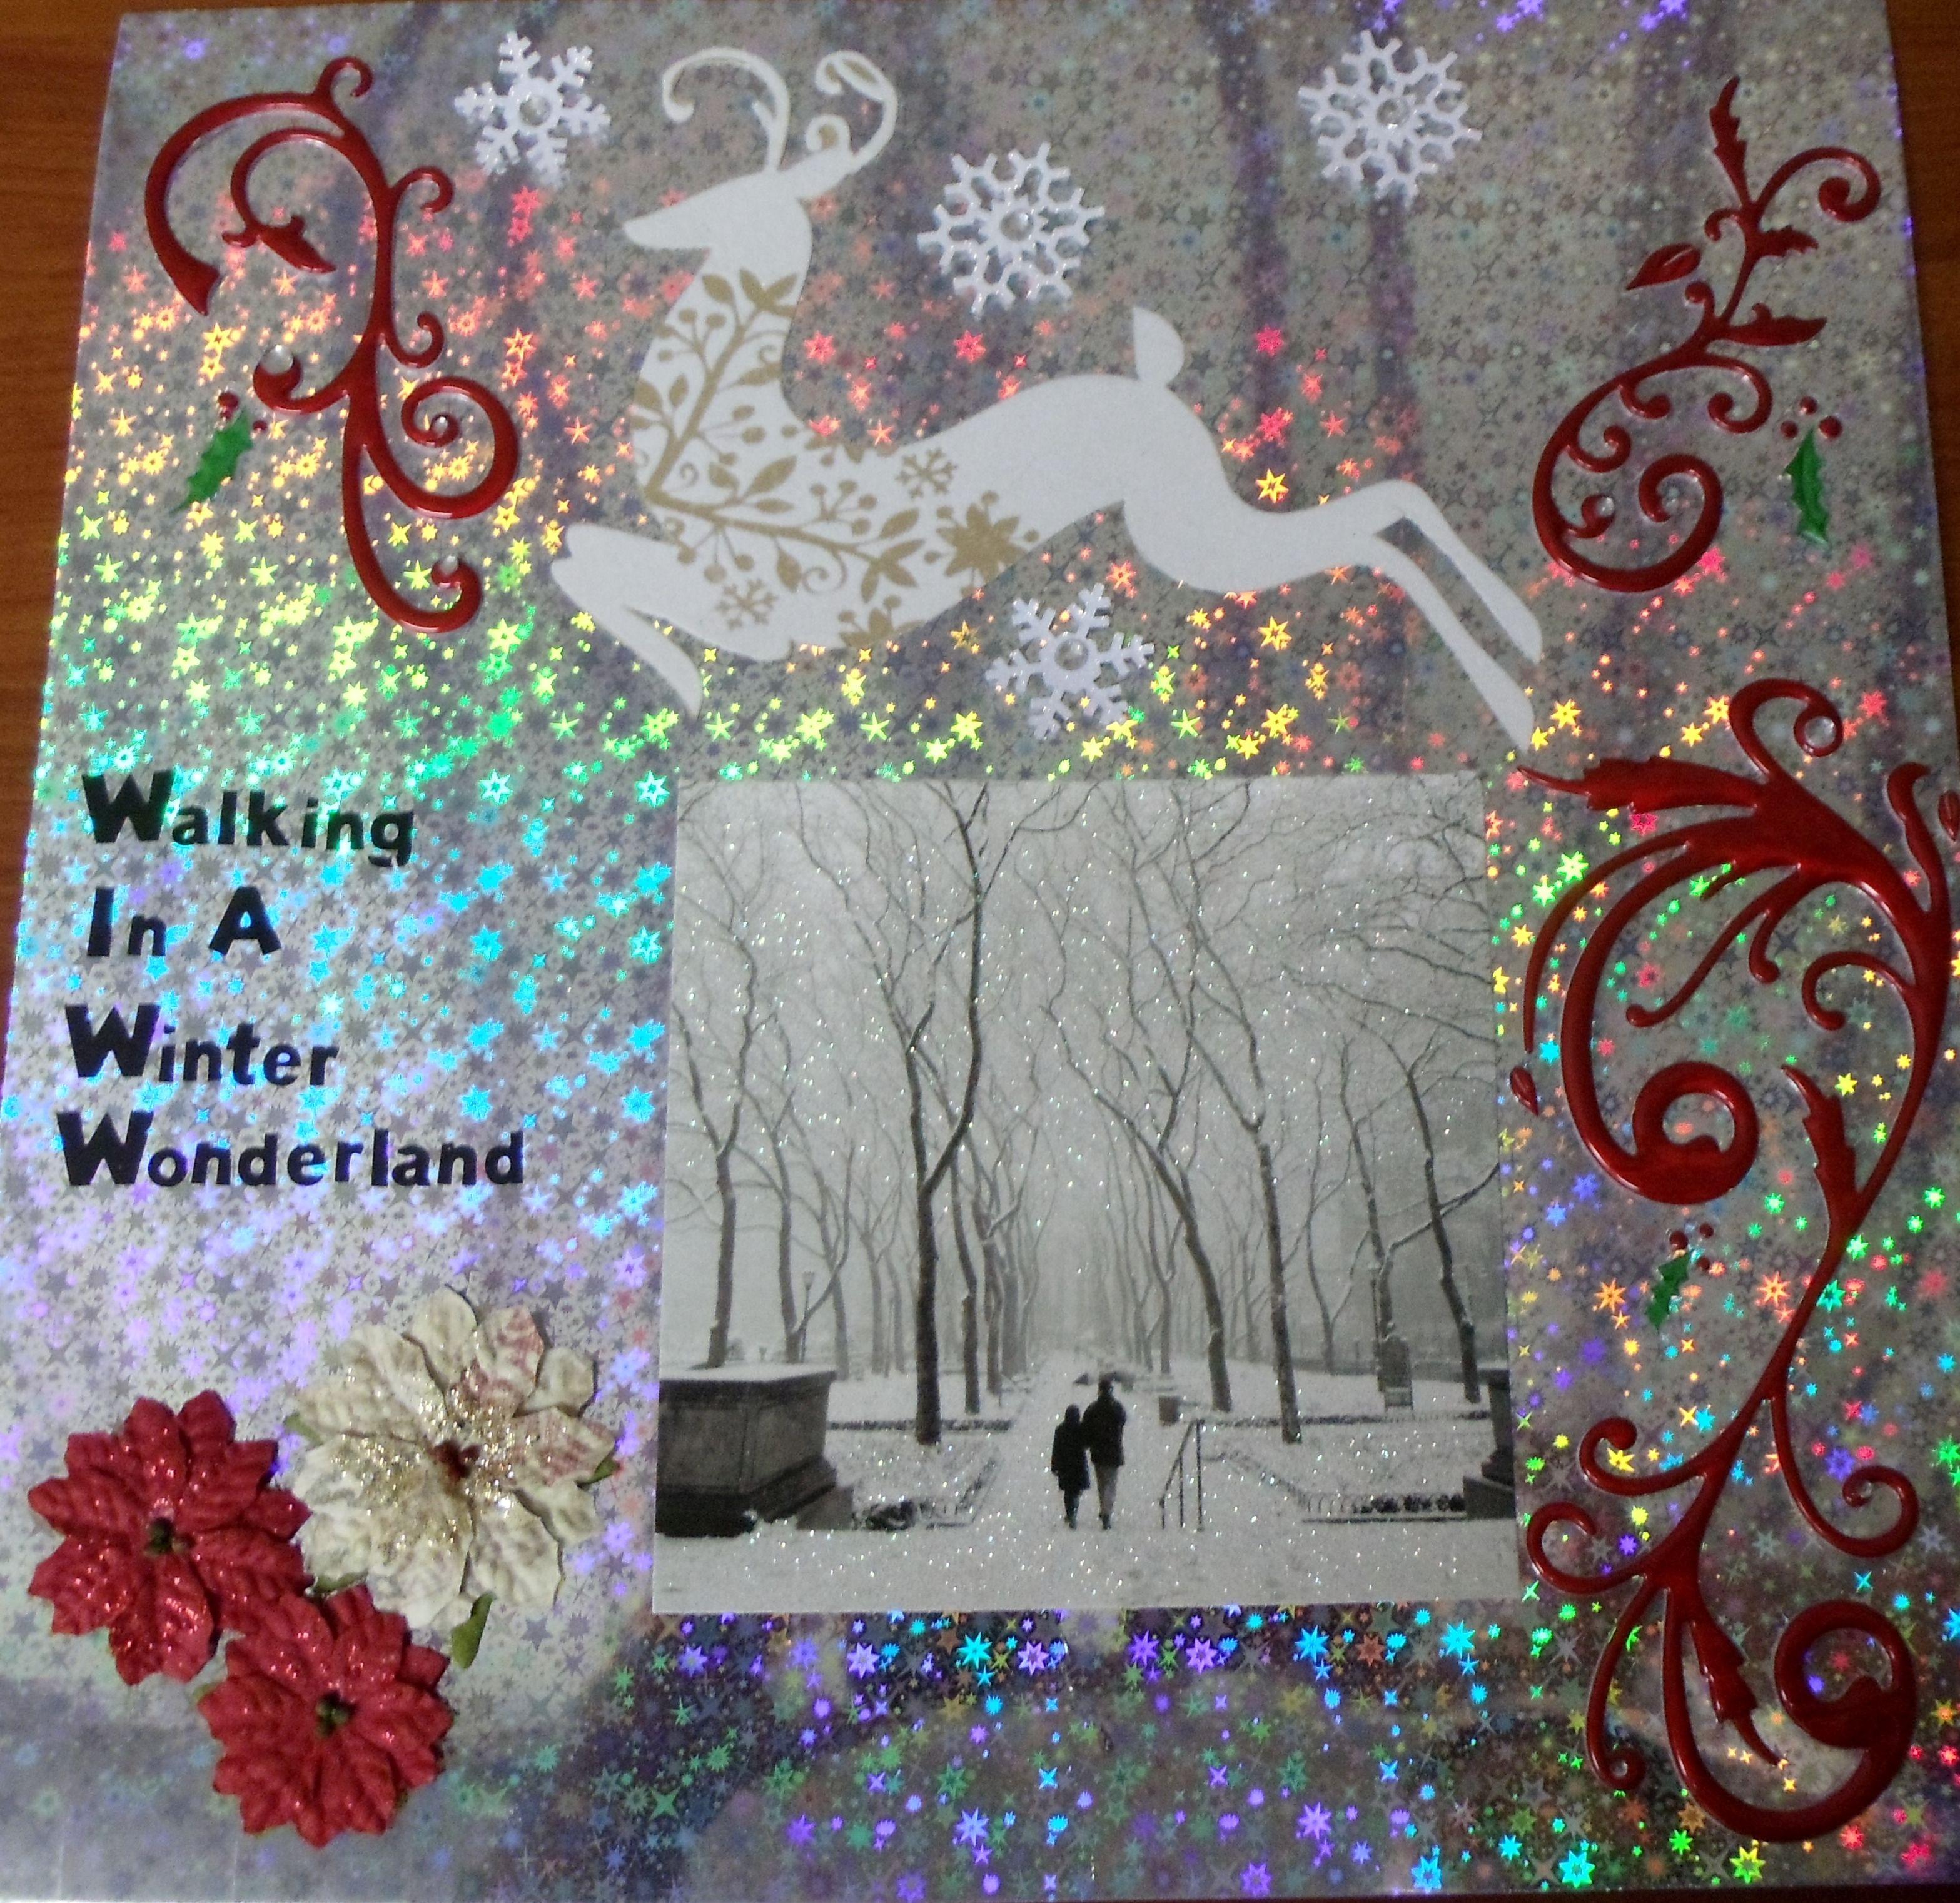 Walking in a Winter Wonderland - Scrapbook.com